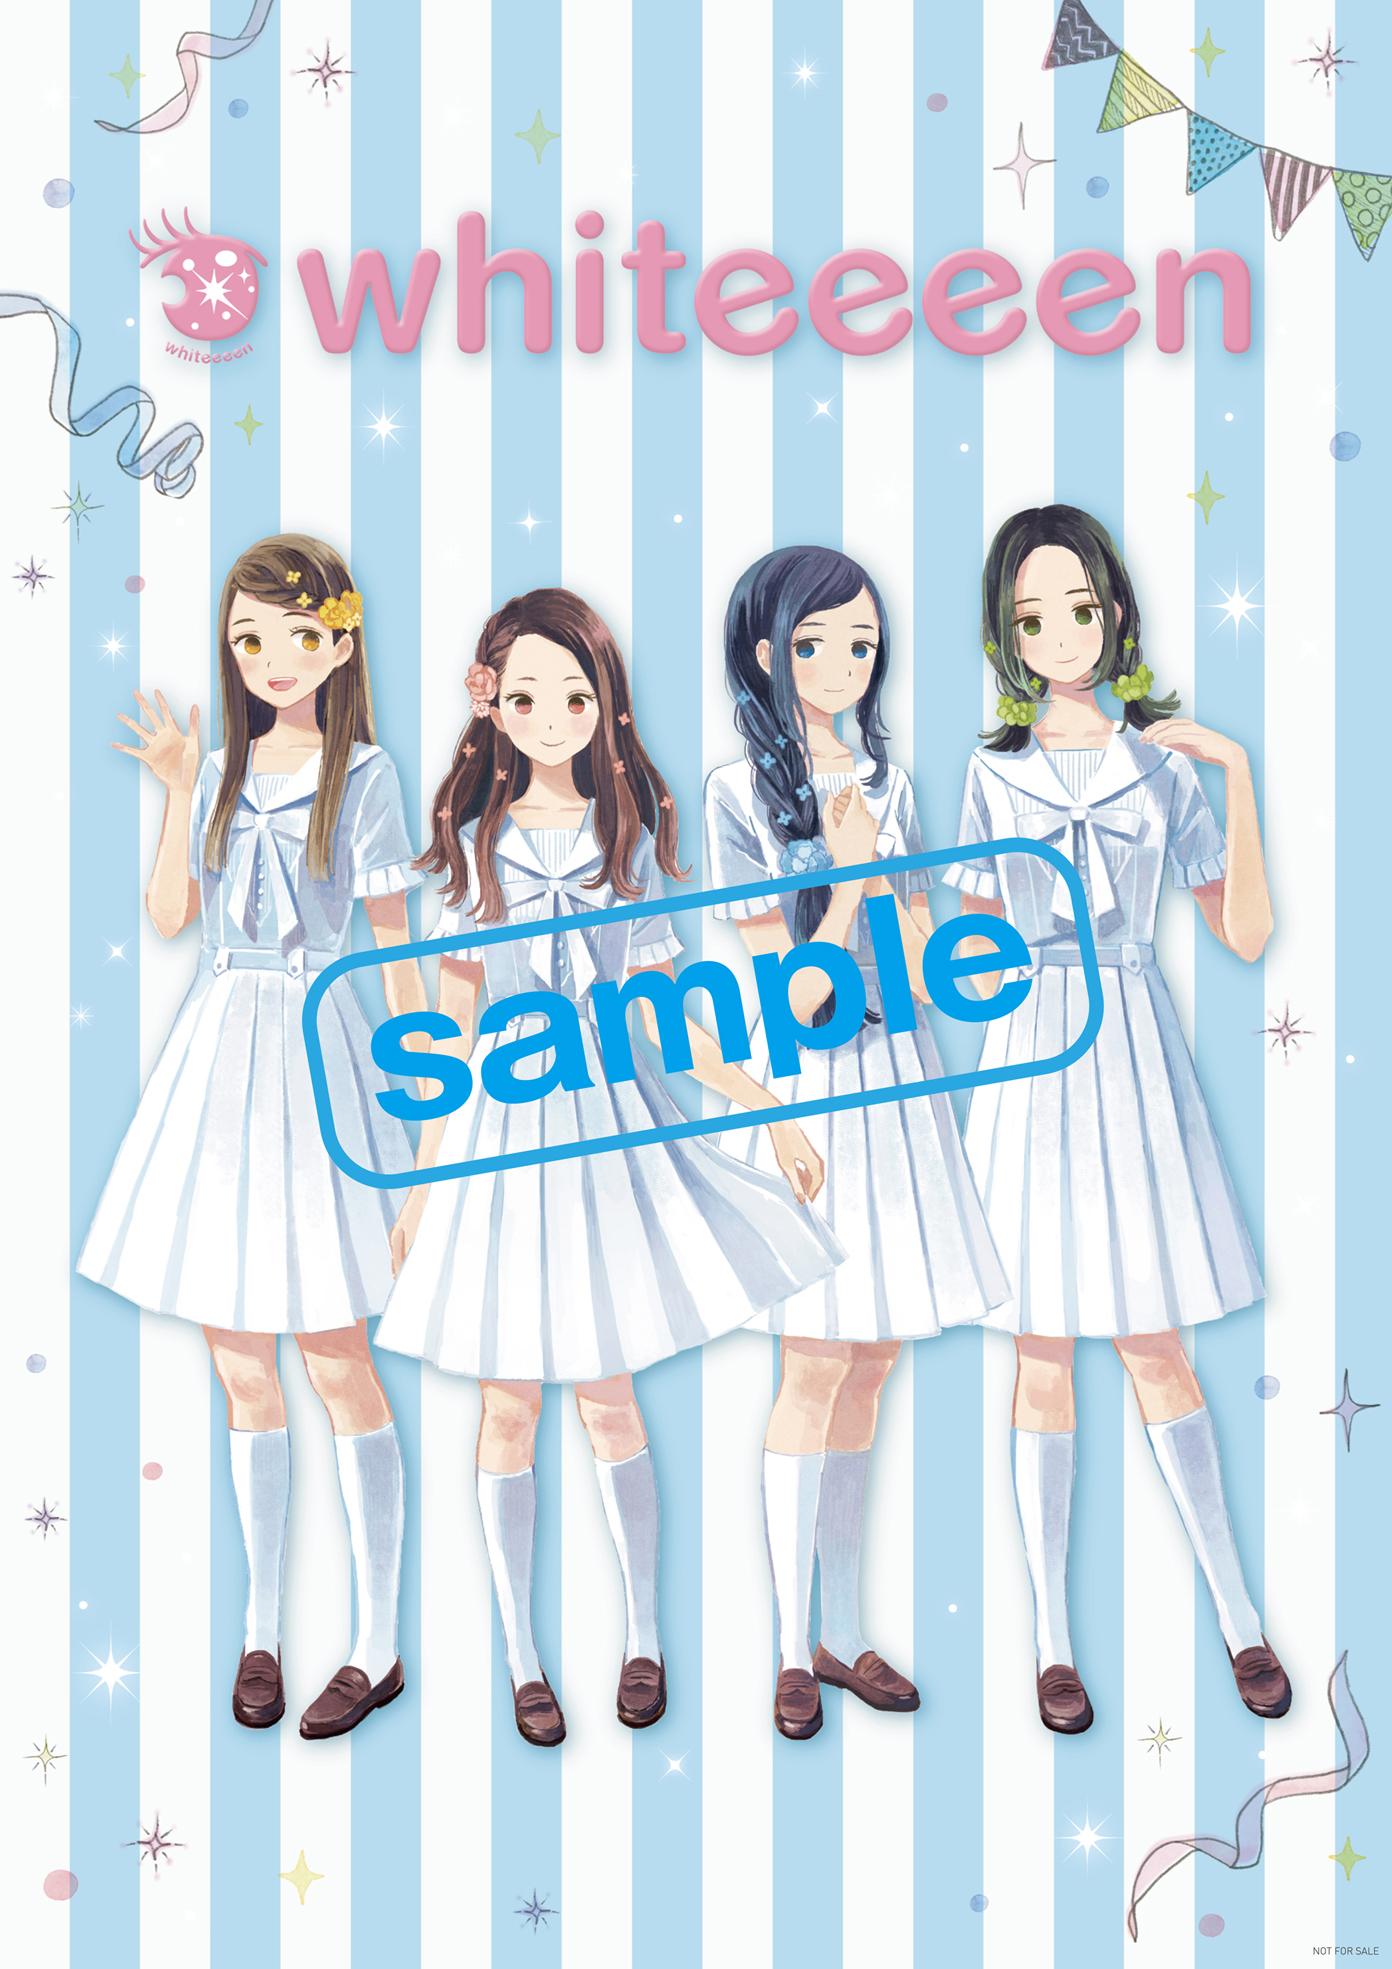 whiteeeen_poster_blue_OL